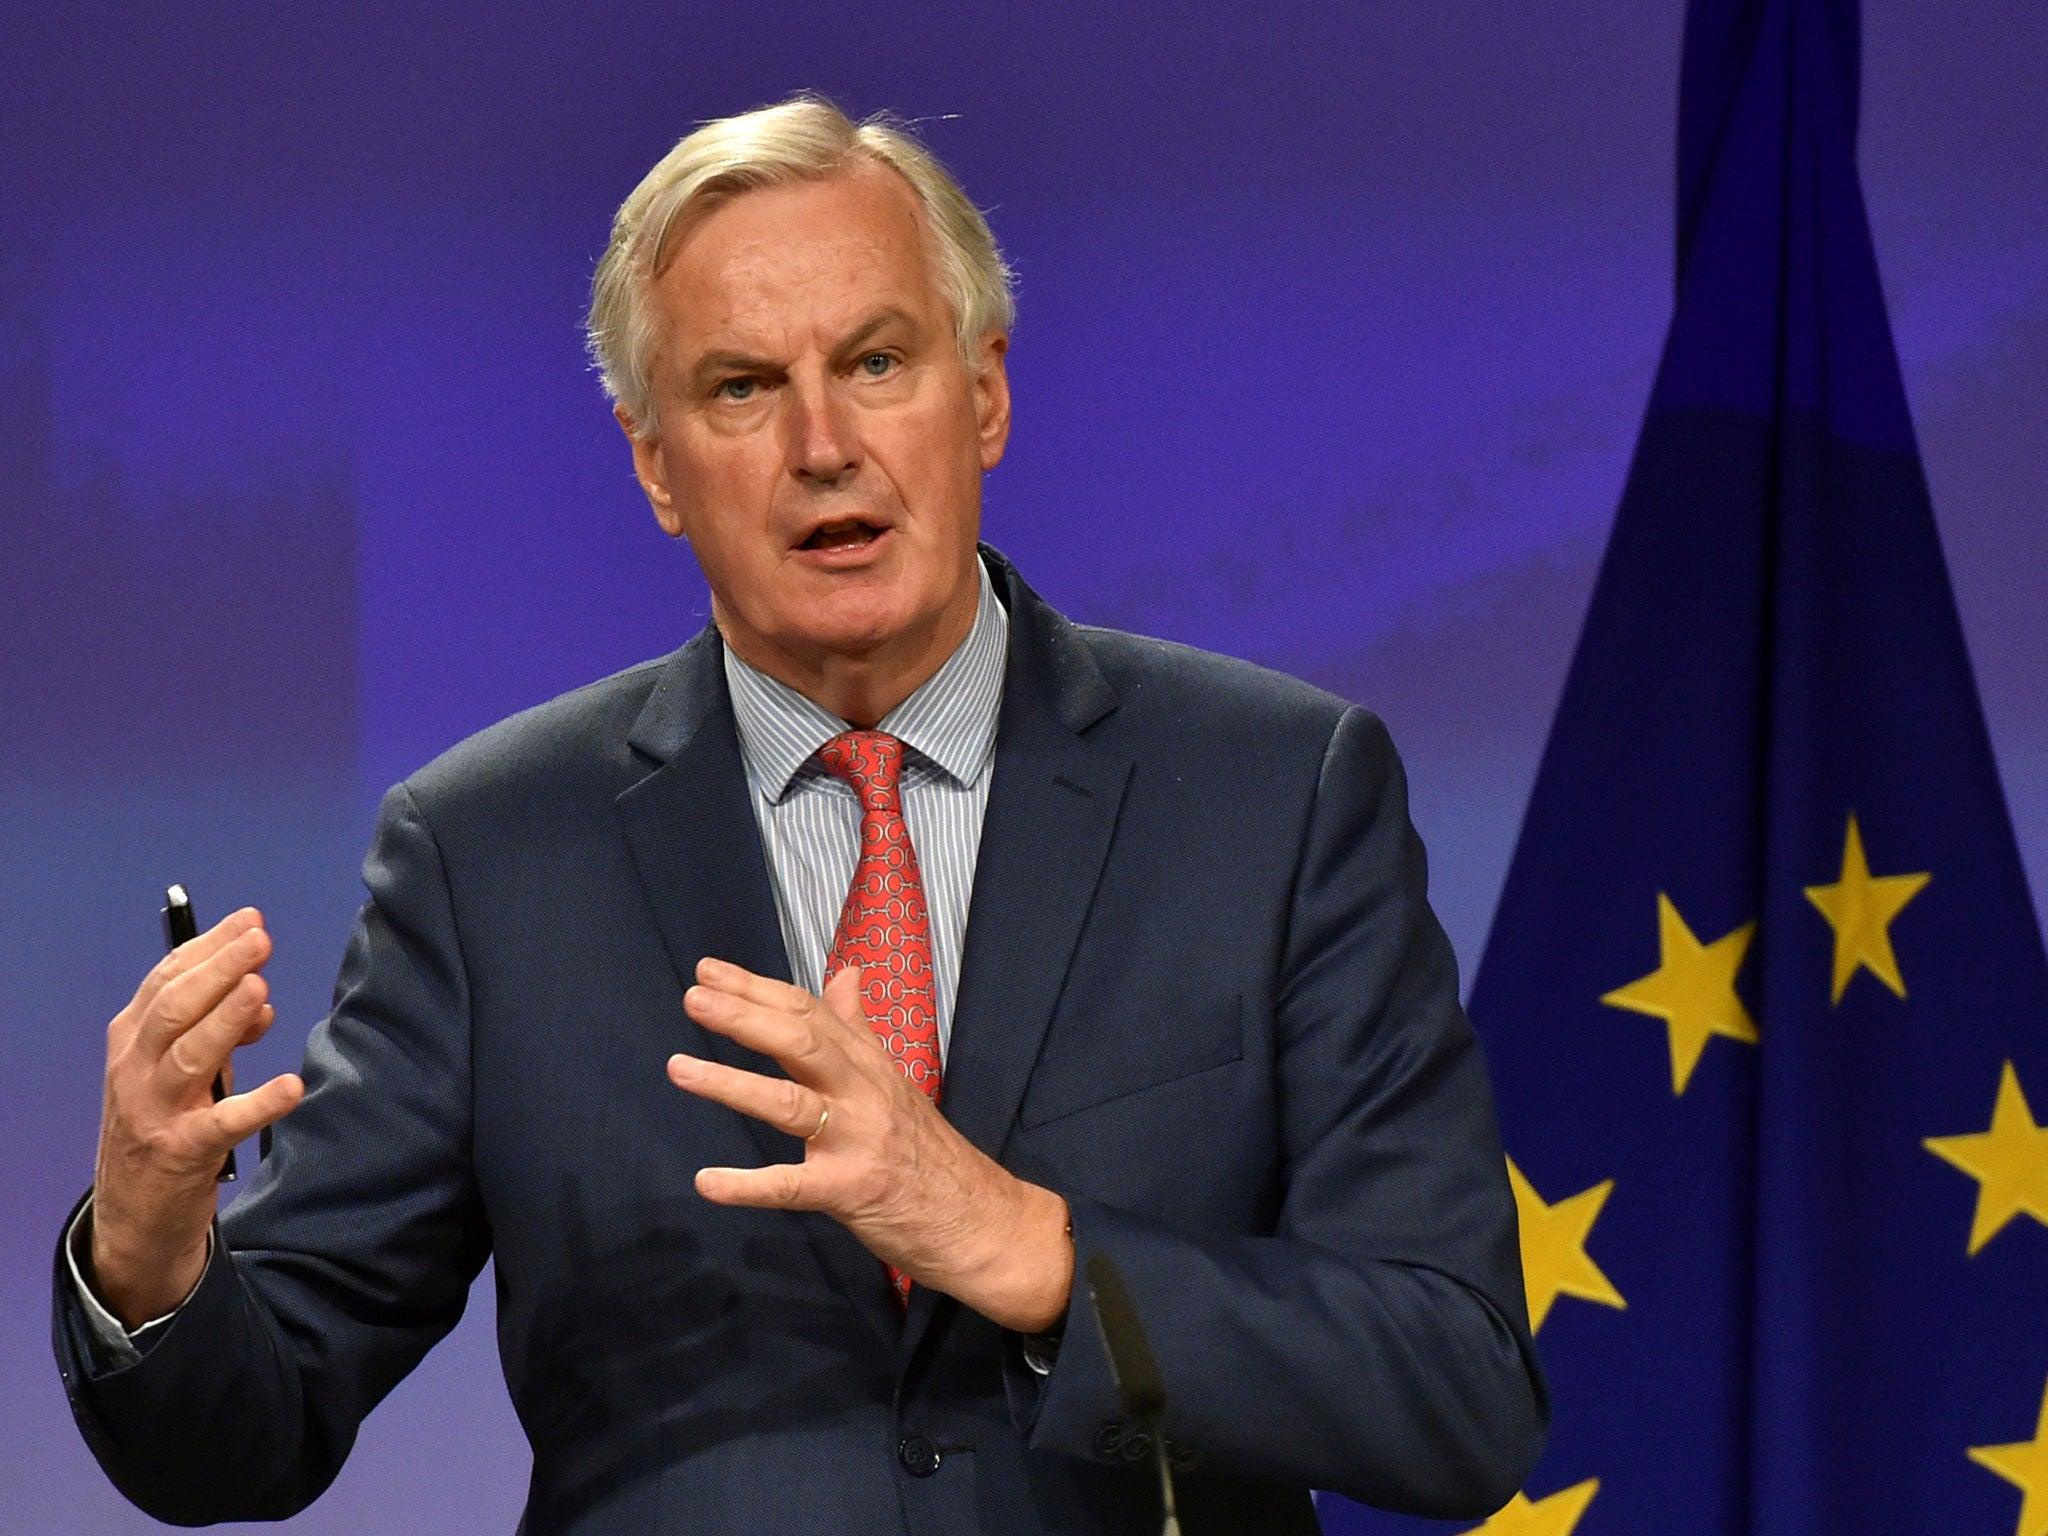 Brexit agreement hopefully in 'next few days', EU chief negotiator Michel Barnier says